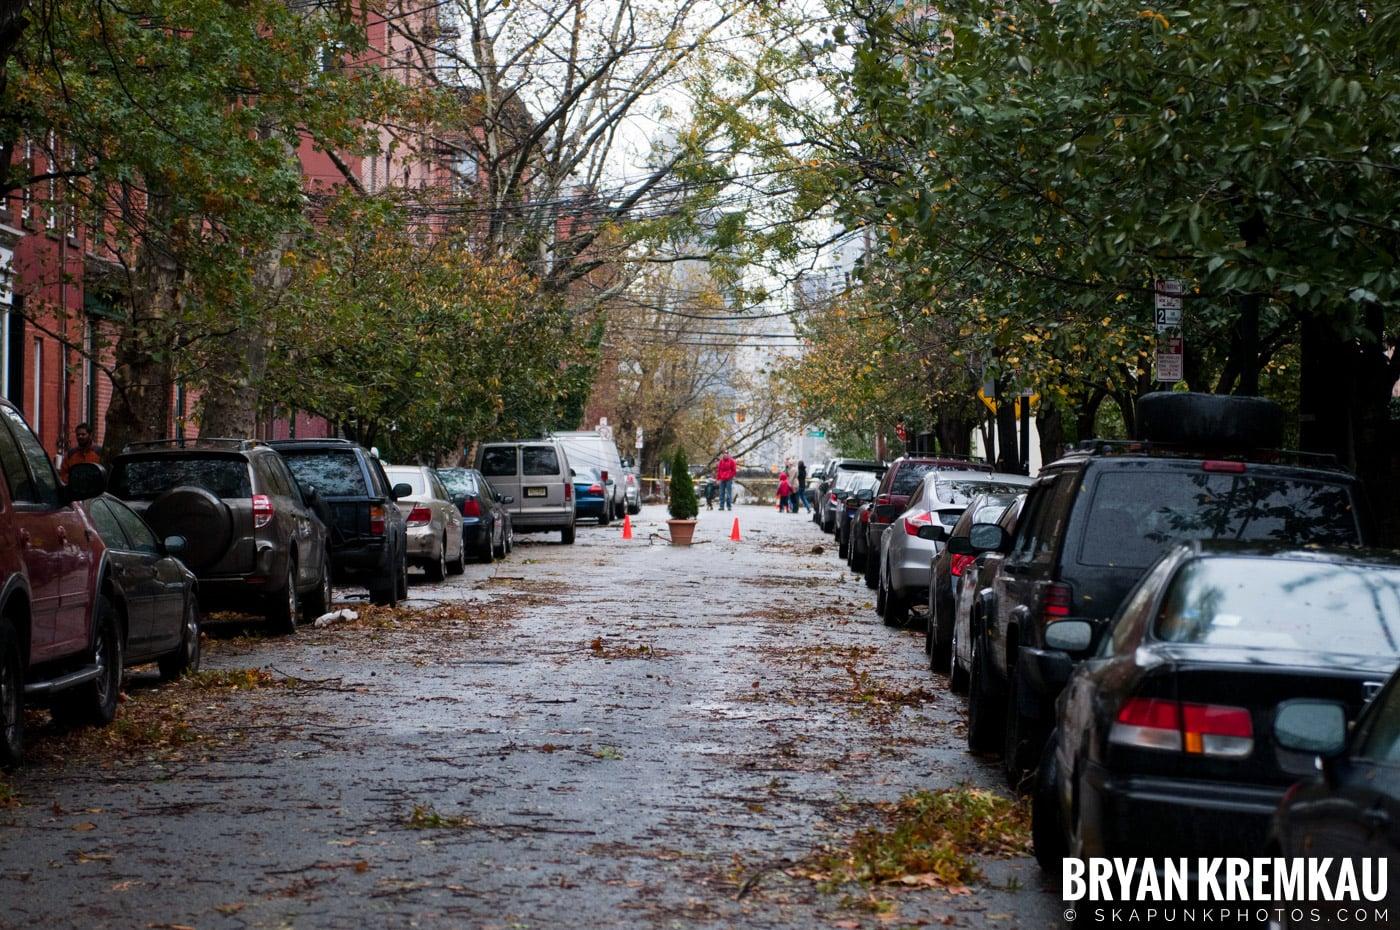 Hurricane Sandy 2012 @ Paulus Hook, Jersey City - 10.29.12 - 10.30.12 (36)